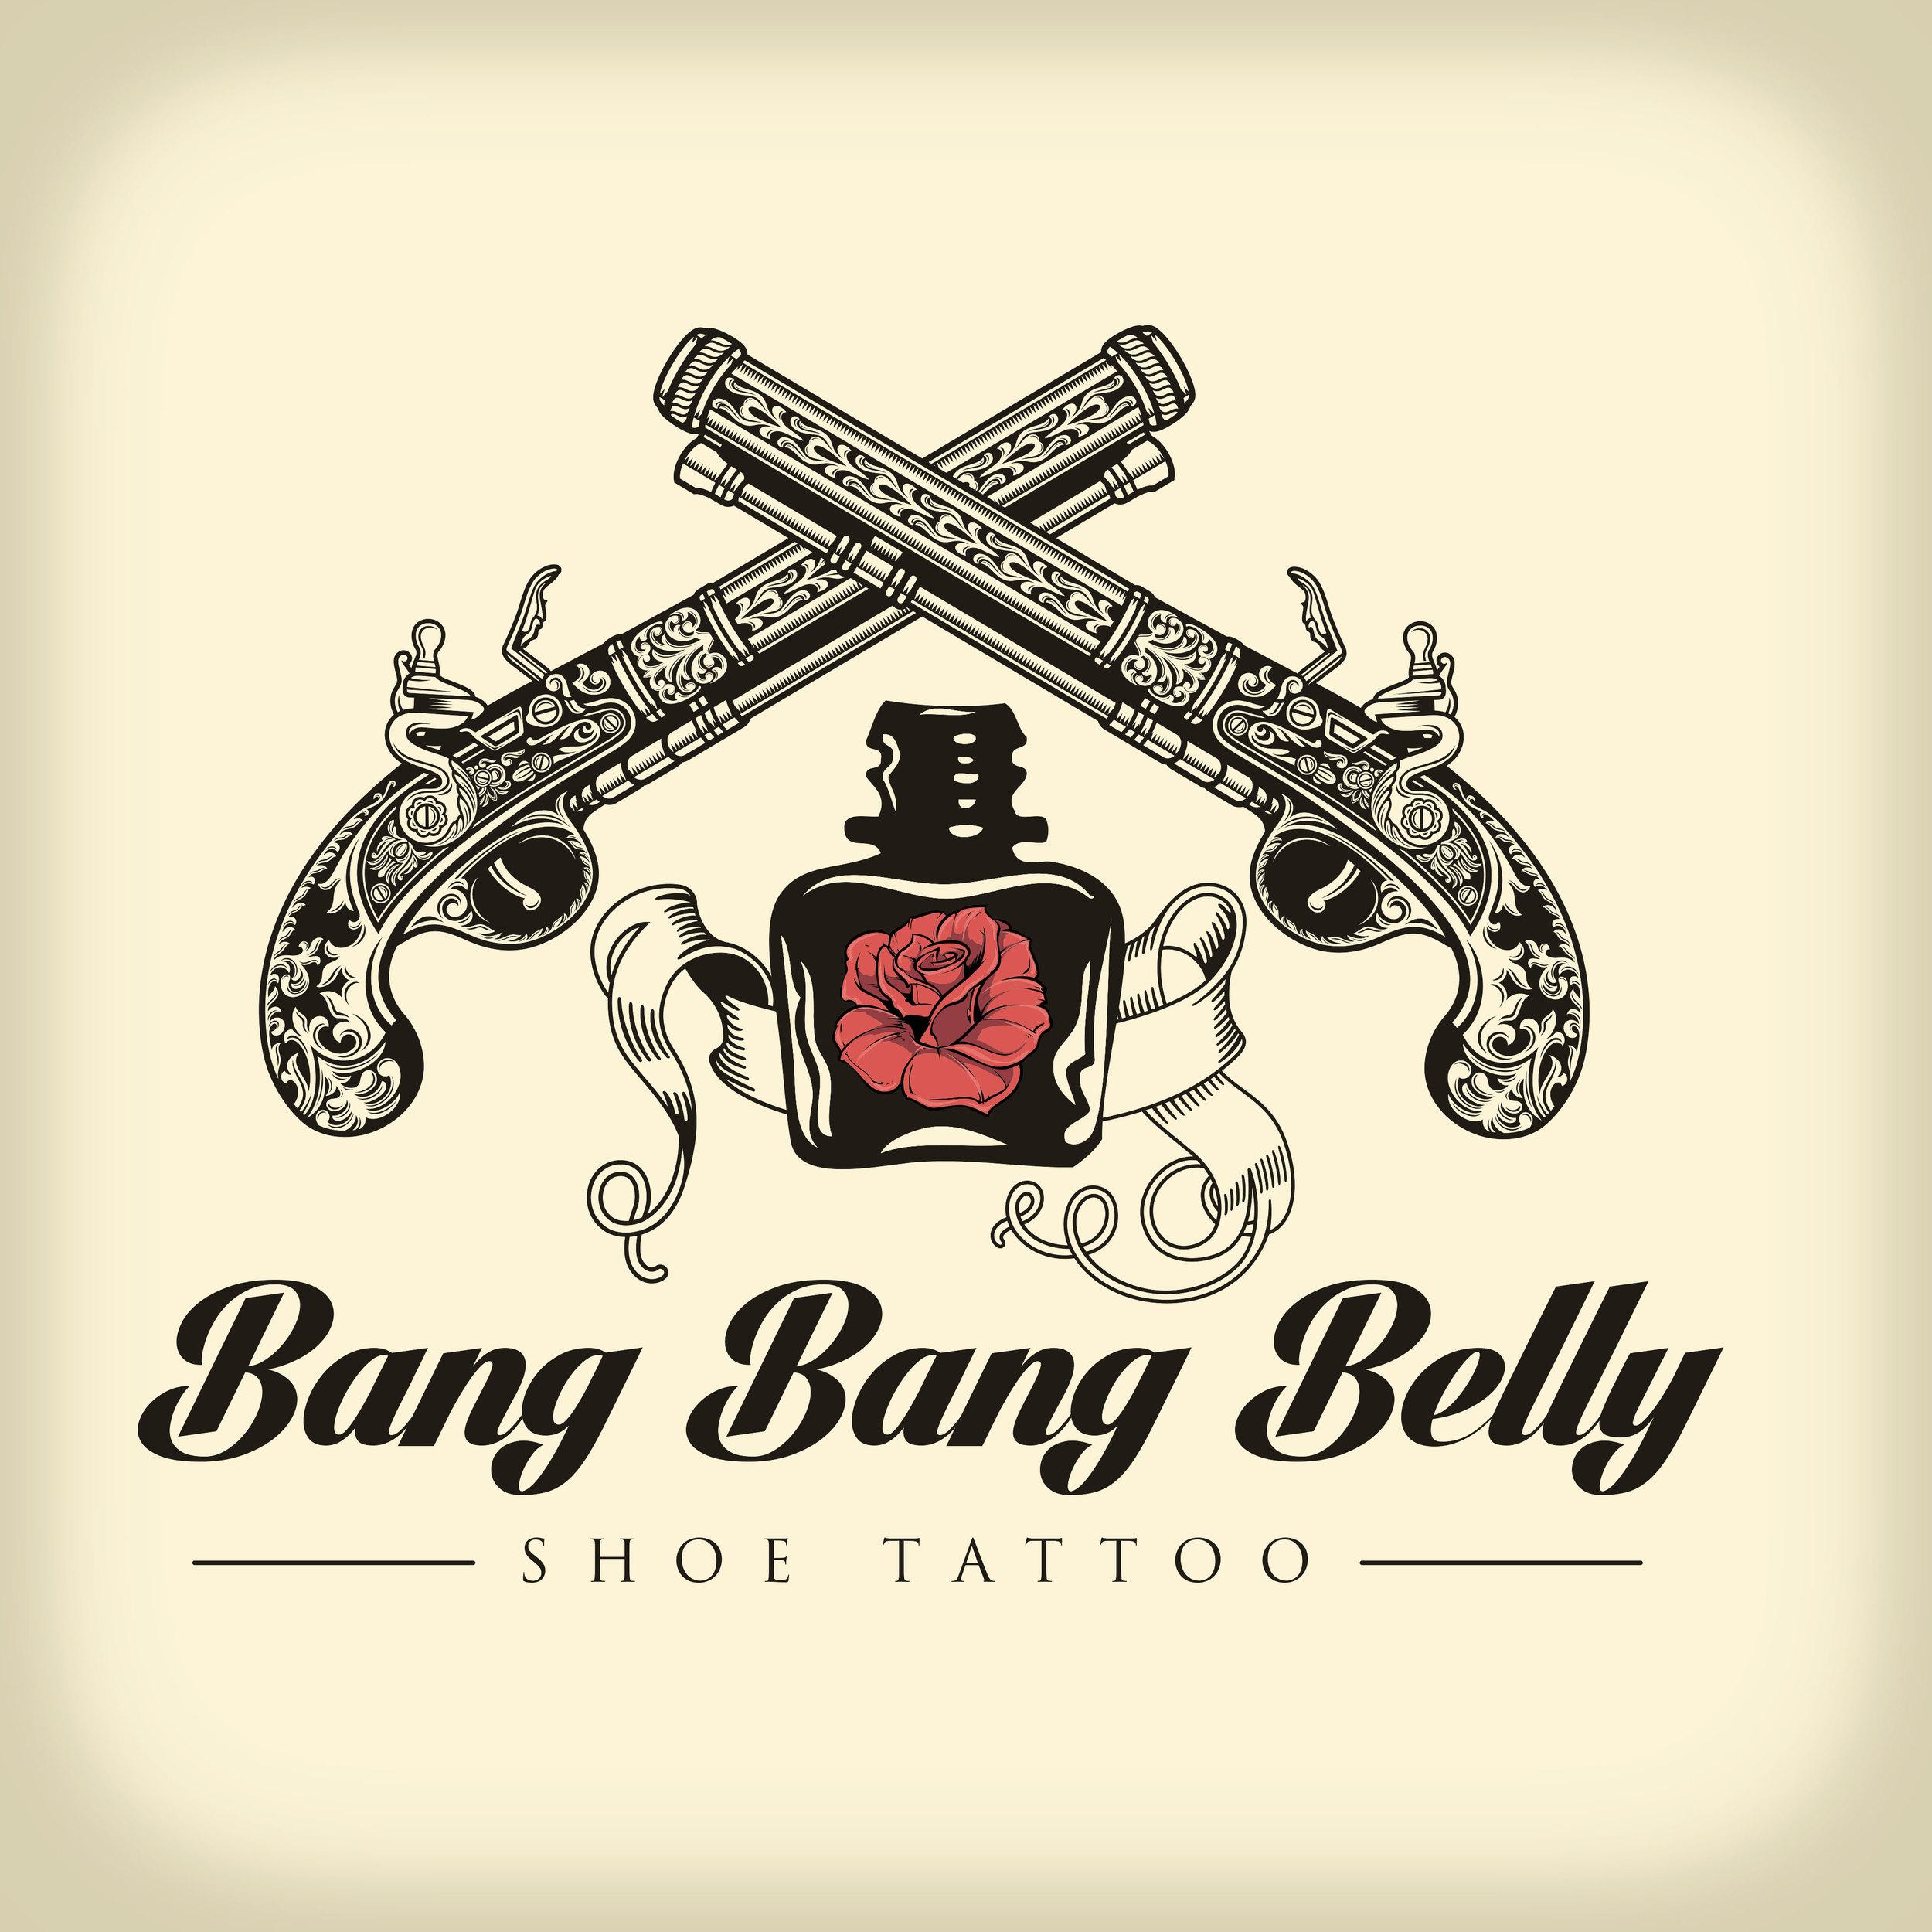 bangbangbelly_vintagestickeropt.jpg